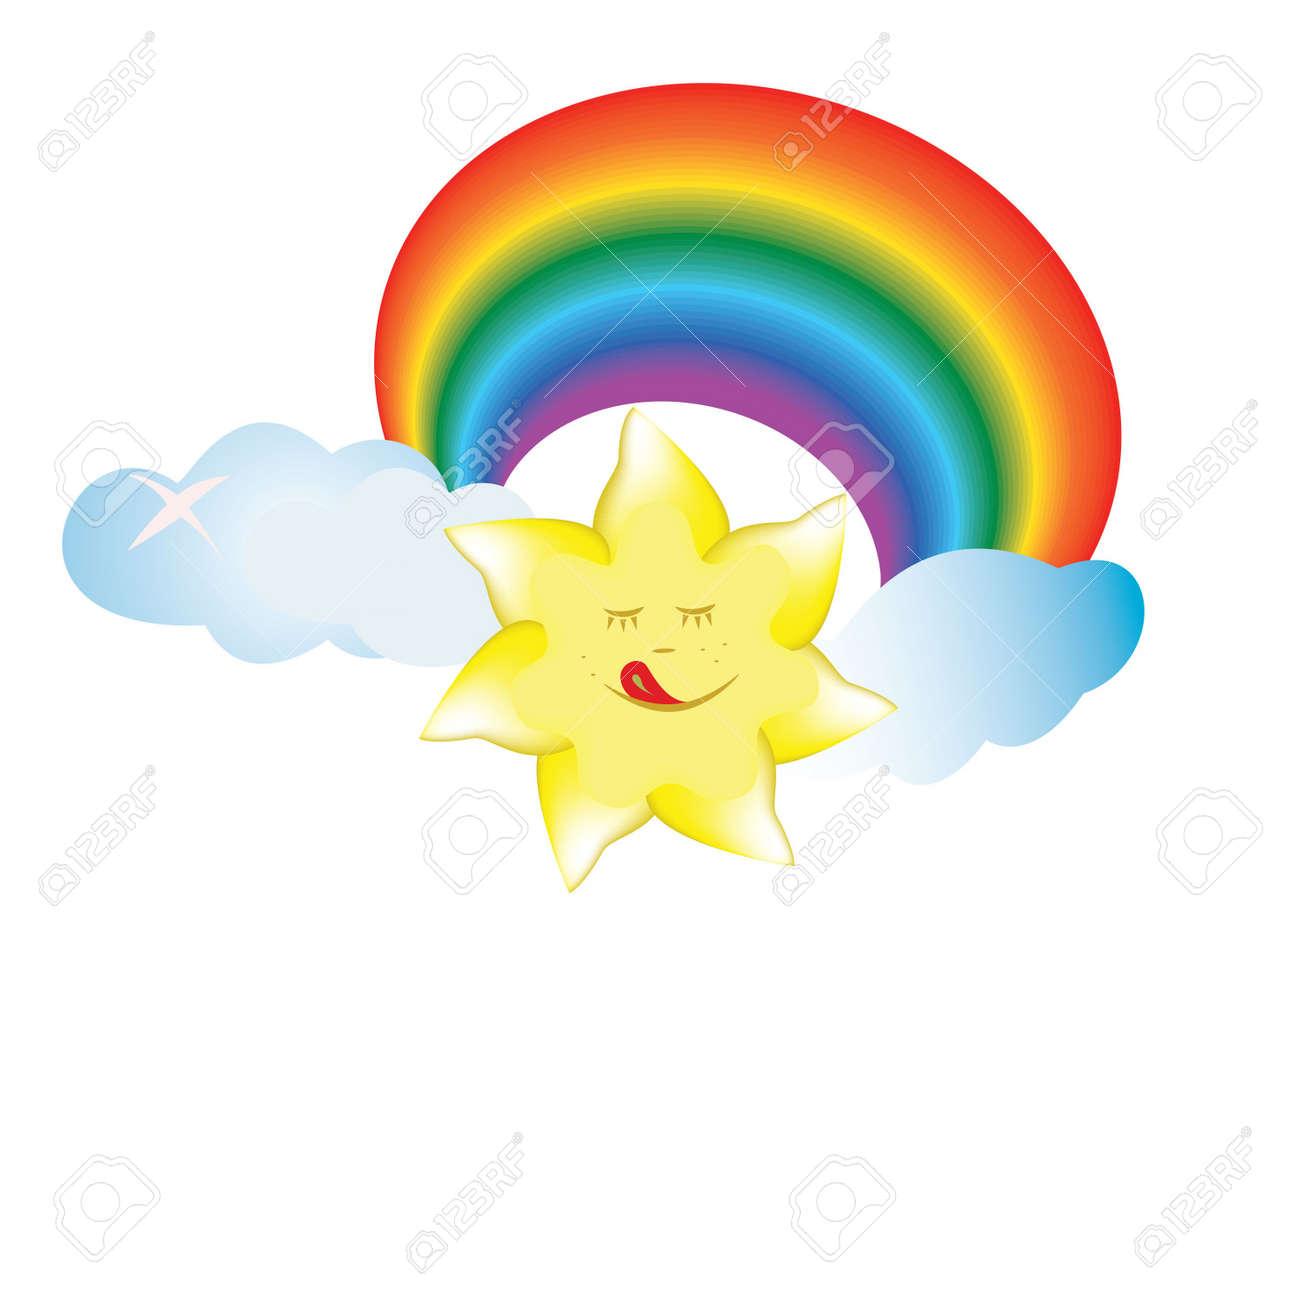 sun, cloud, rainbow, smile, sky, colorful illustration Stock Vector - 20298247